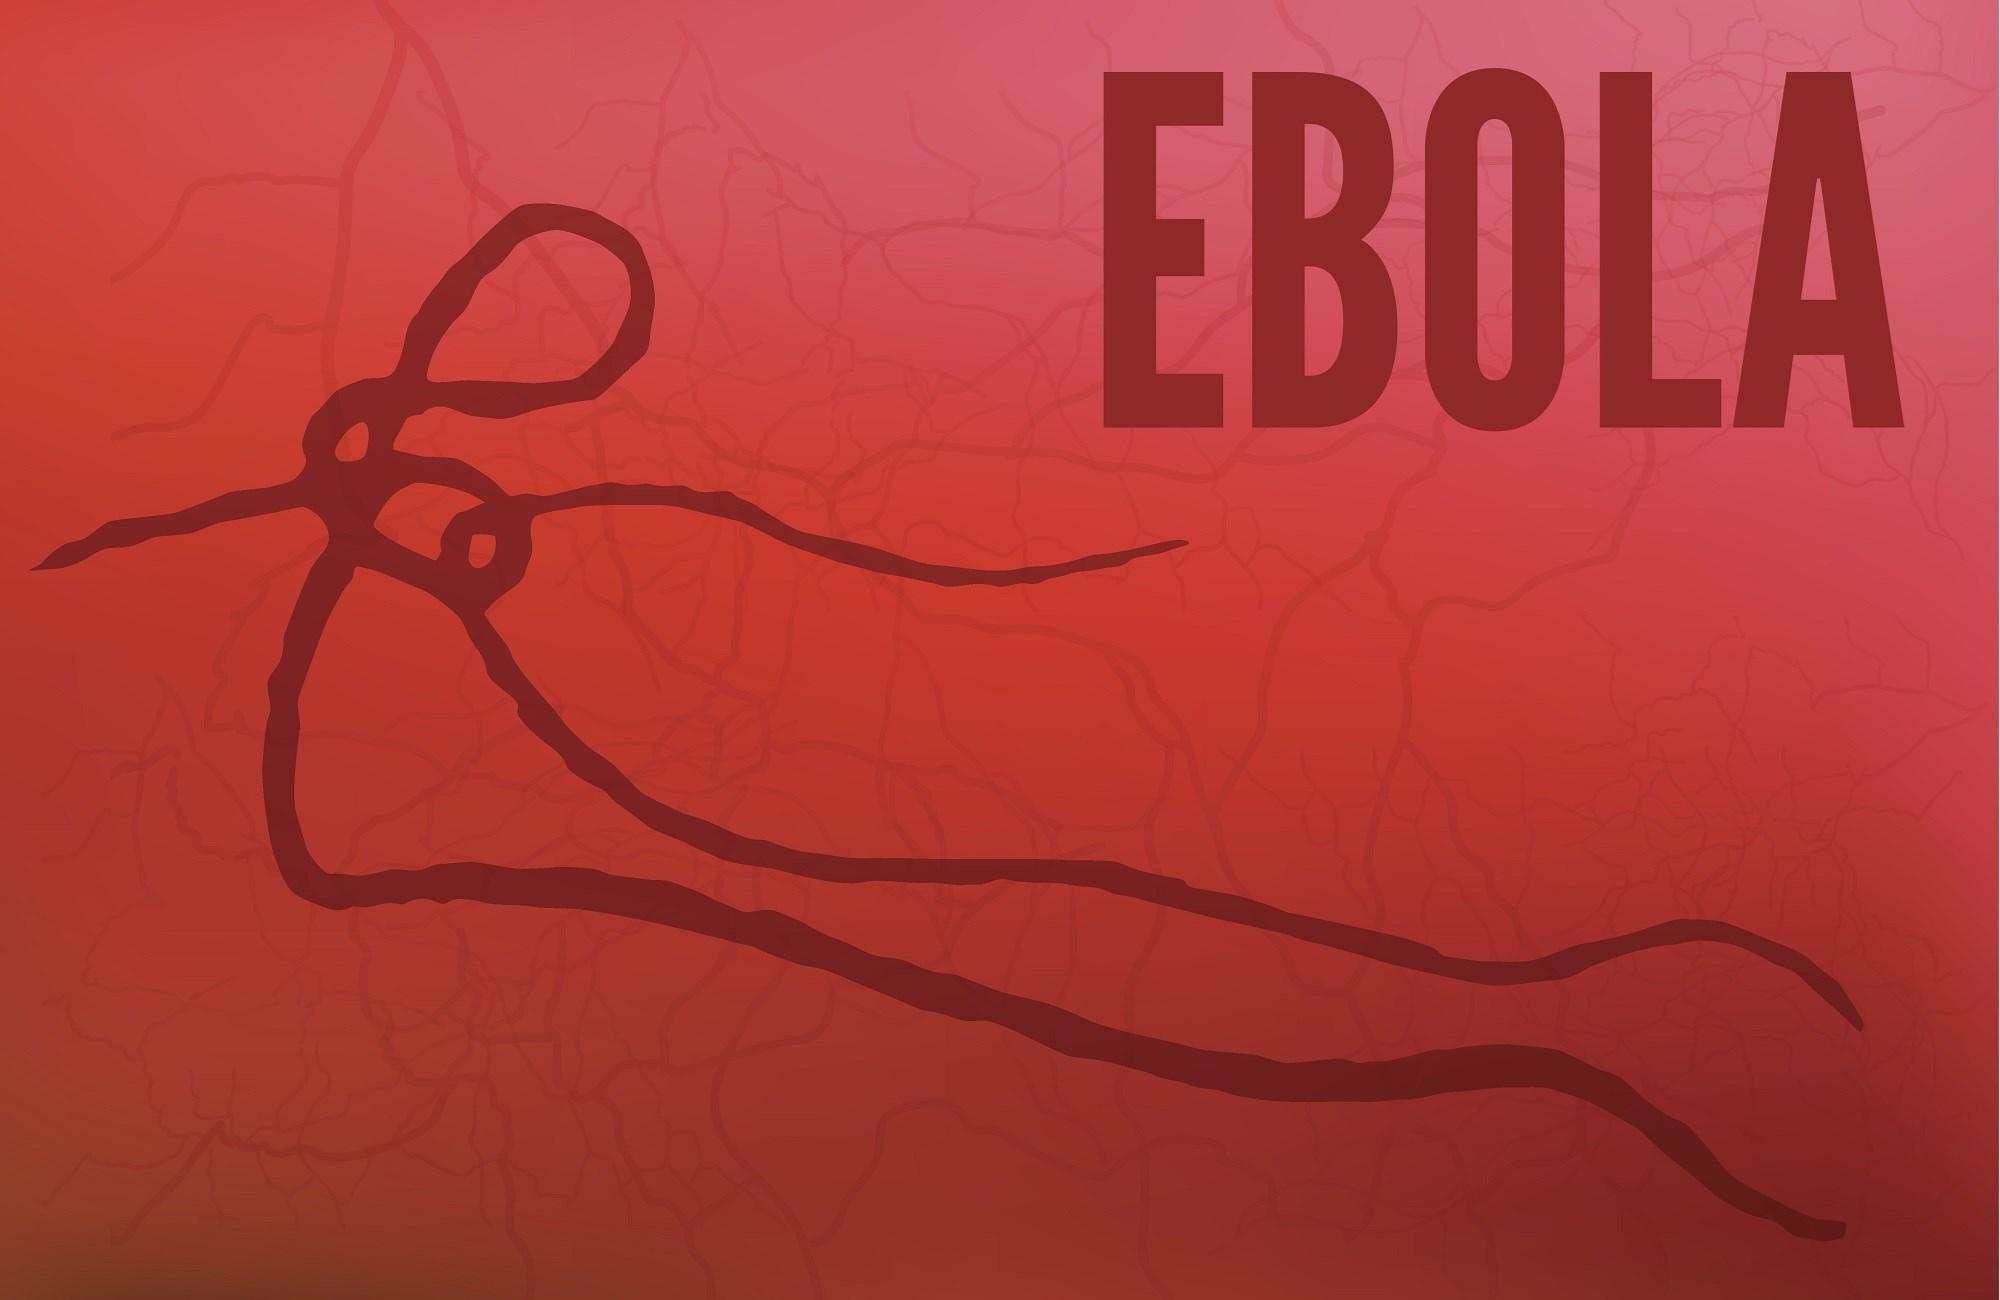 Doctor in United States Monitored for Ebola Exposure in Nebraska Hospital